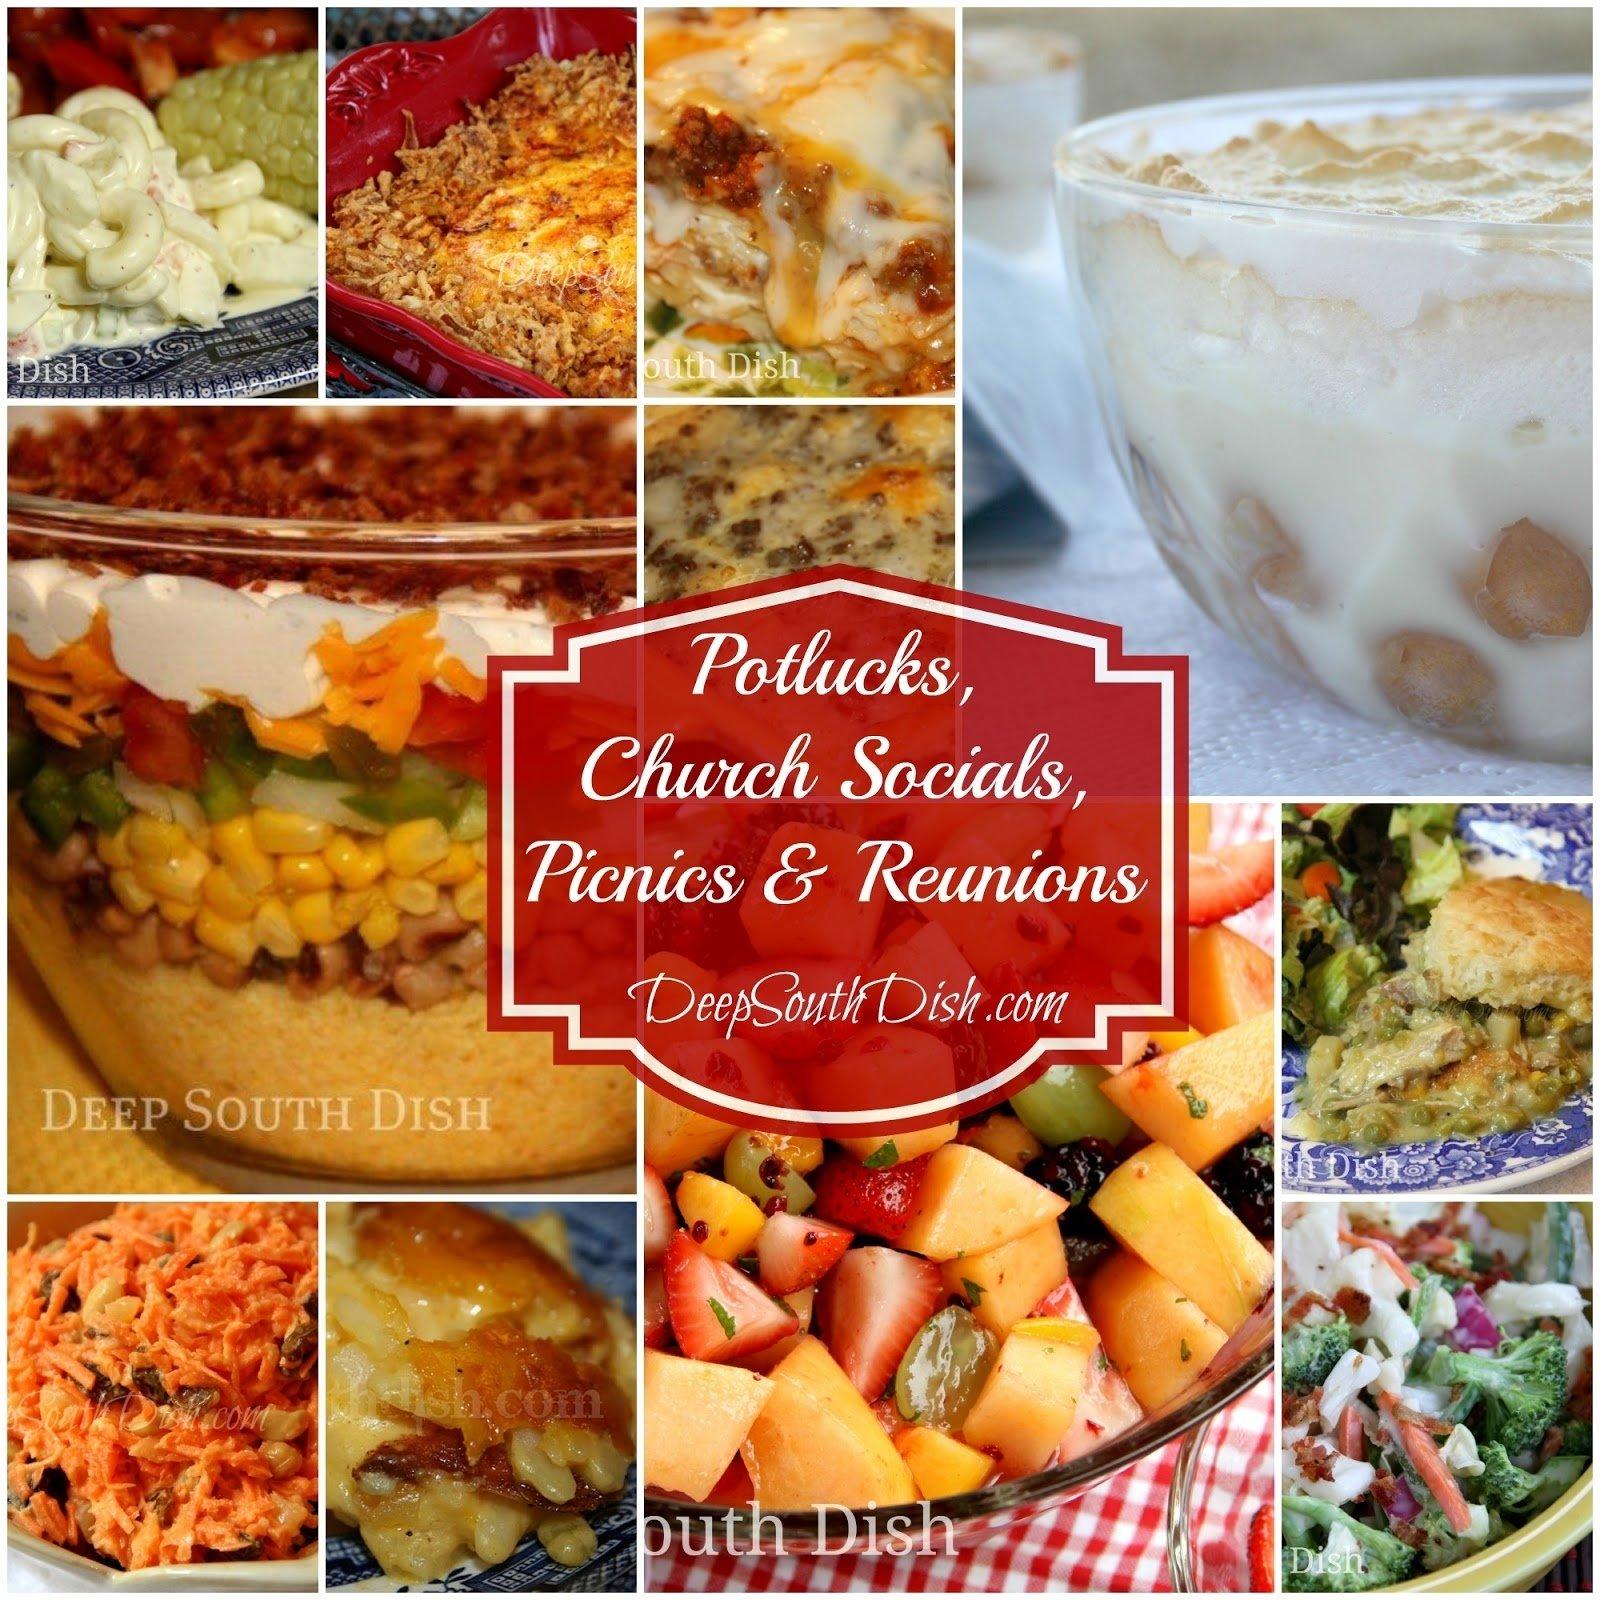 10 Lovely Quick And Easy Potluck Ideas deep south dish recipes for potlucks church socials picnics 5 2020